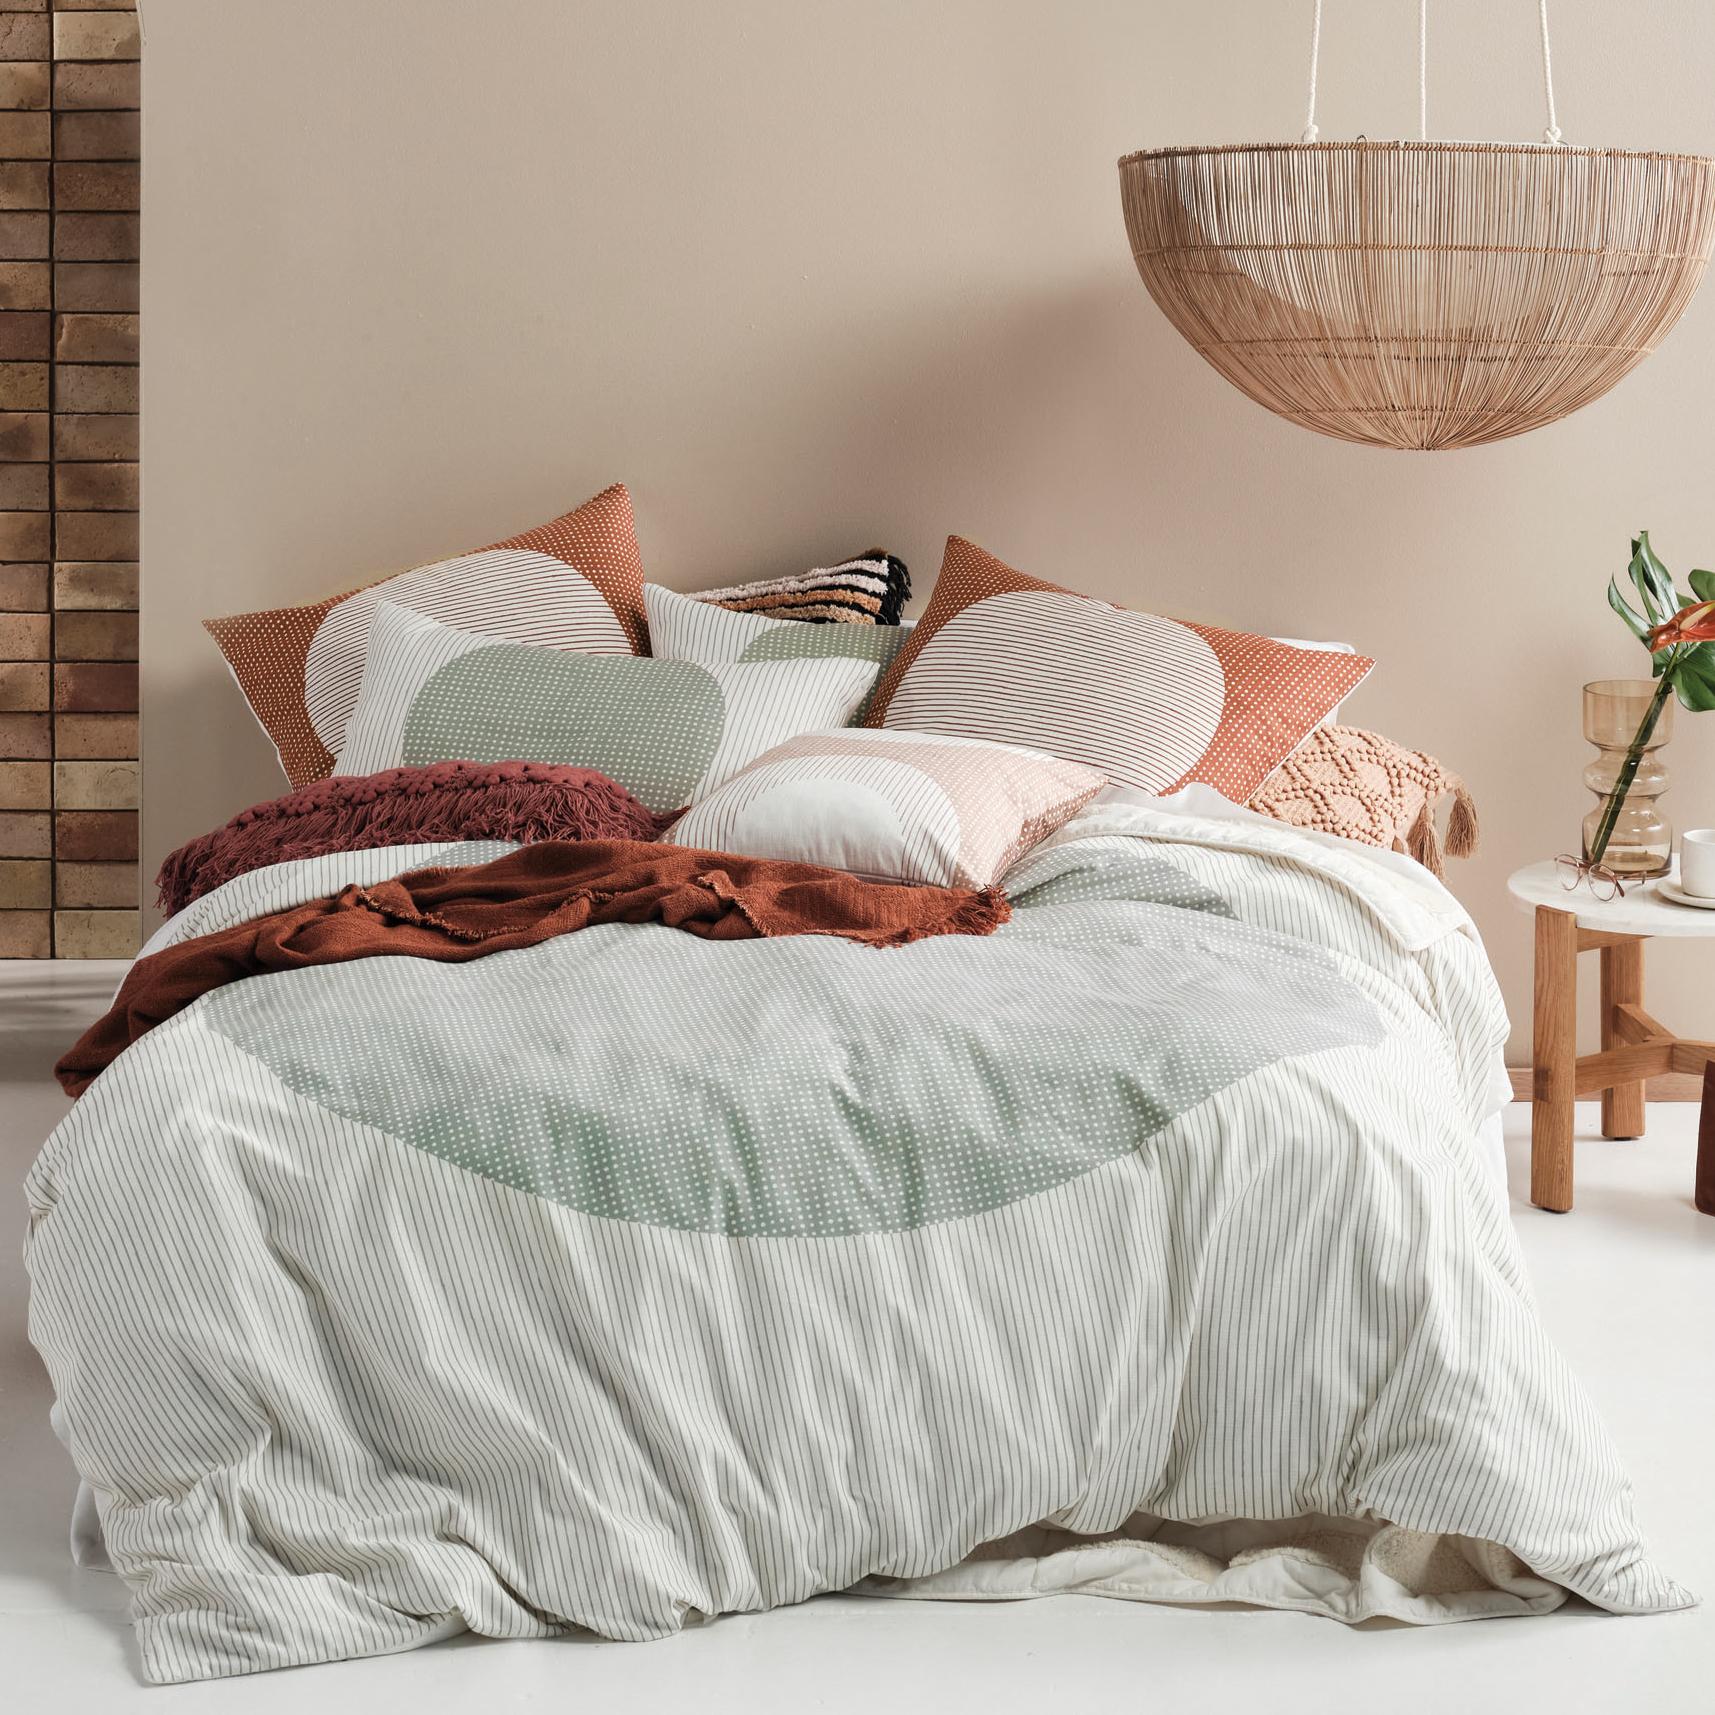 Linen House Stillwater Solar Cotton Quilt Cover Set Temple Webster